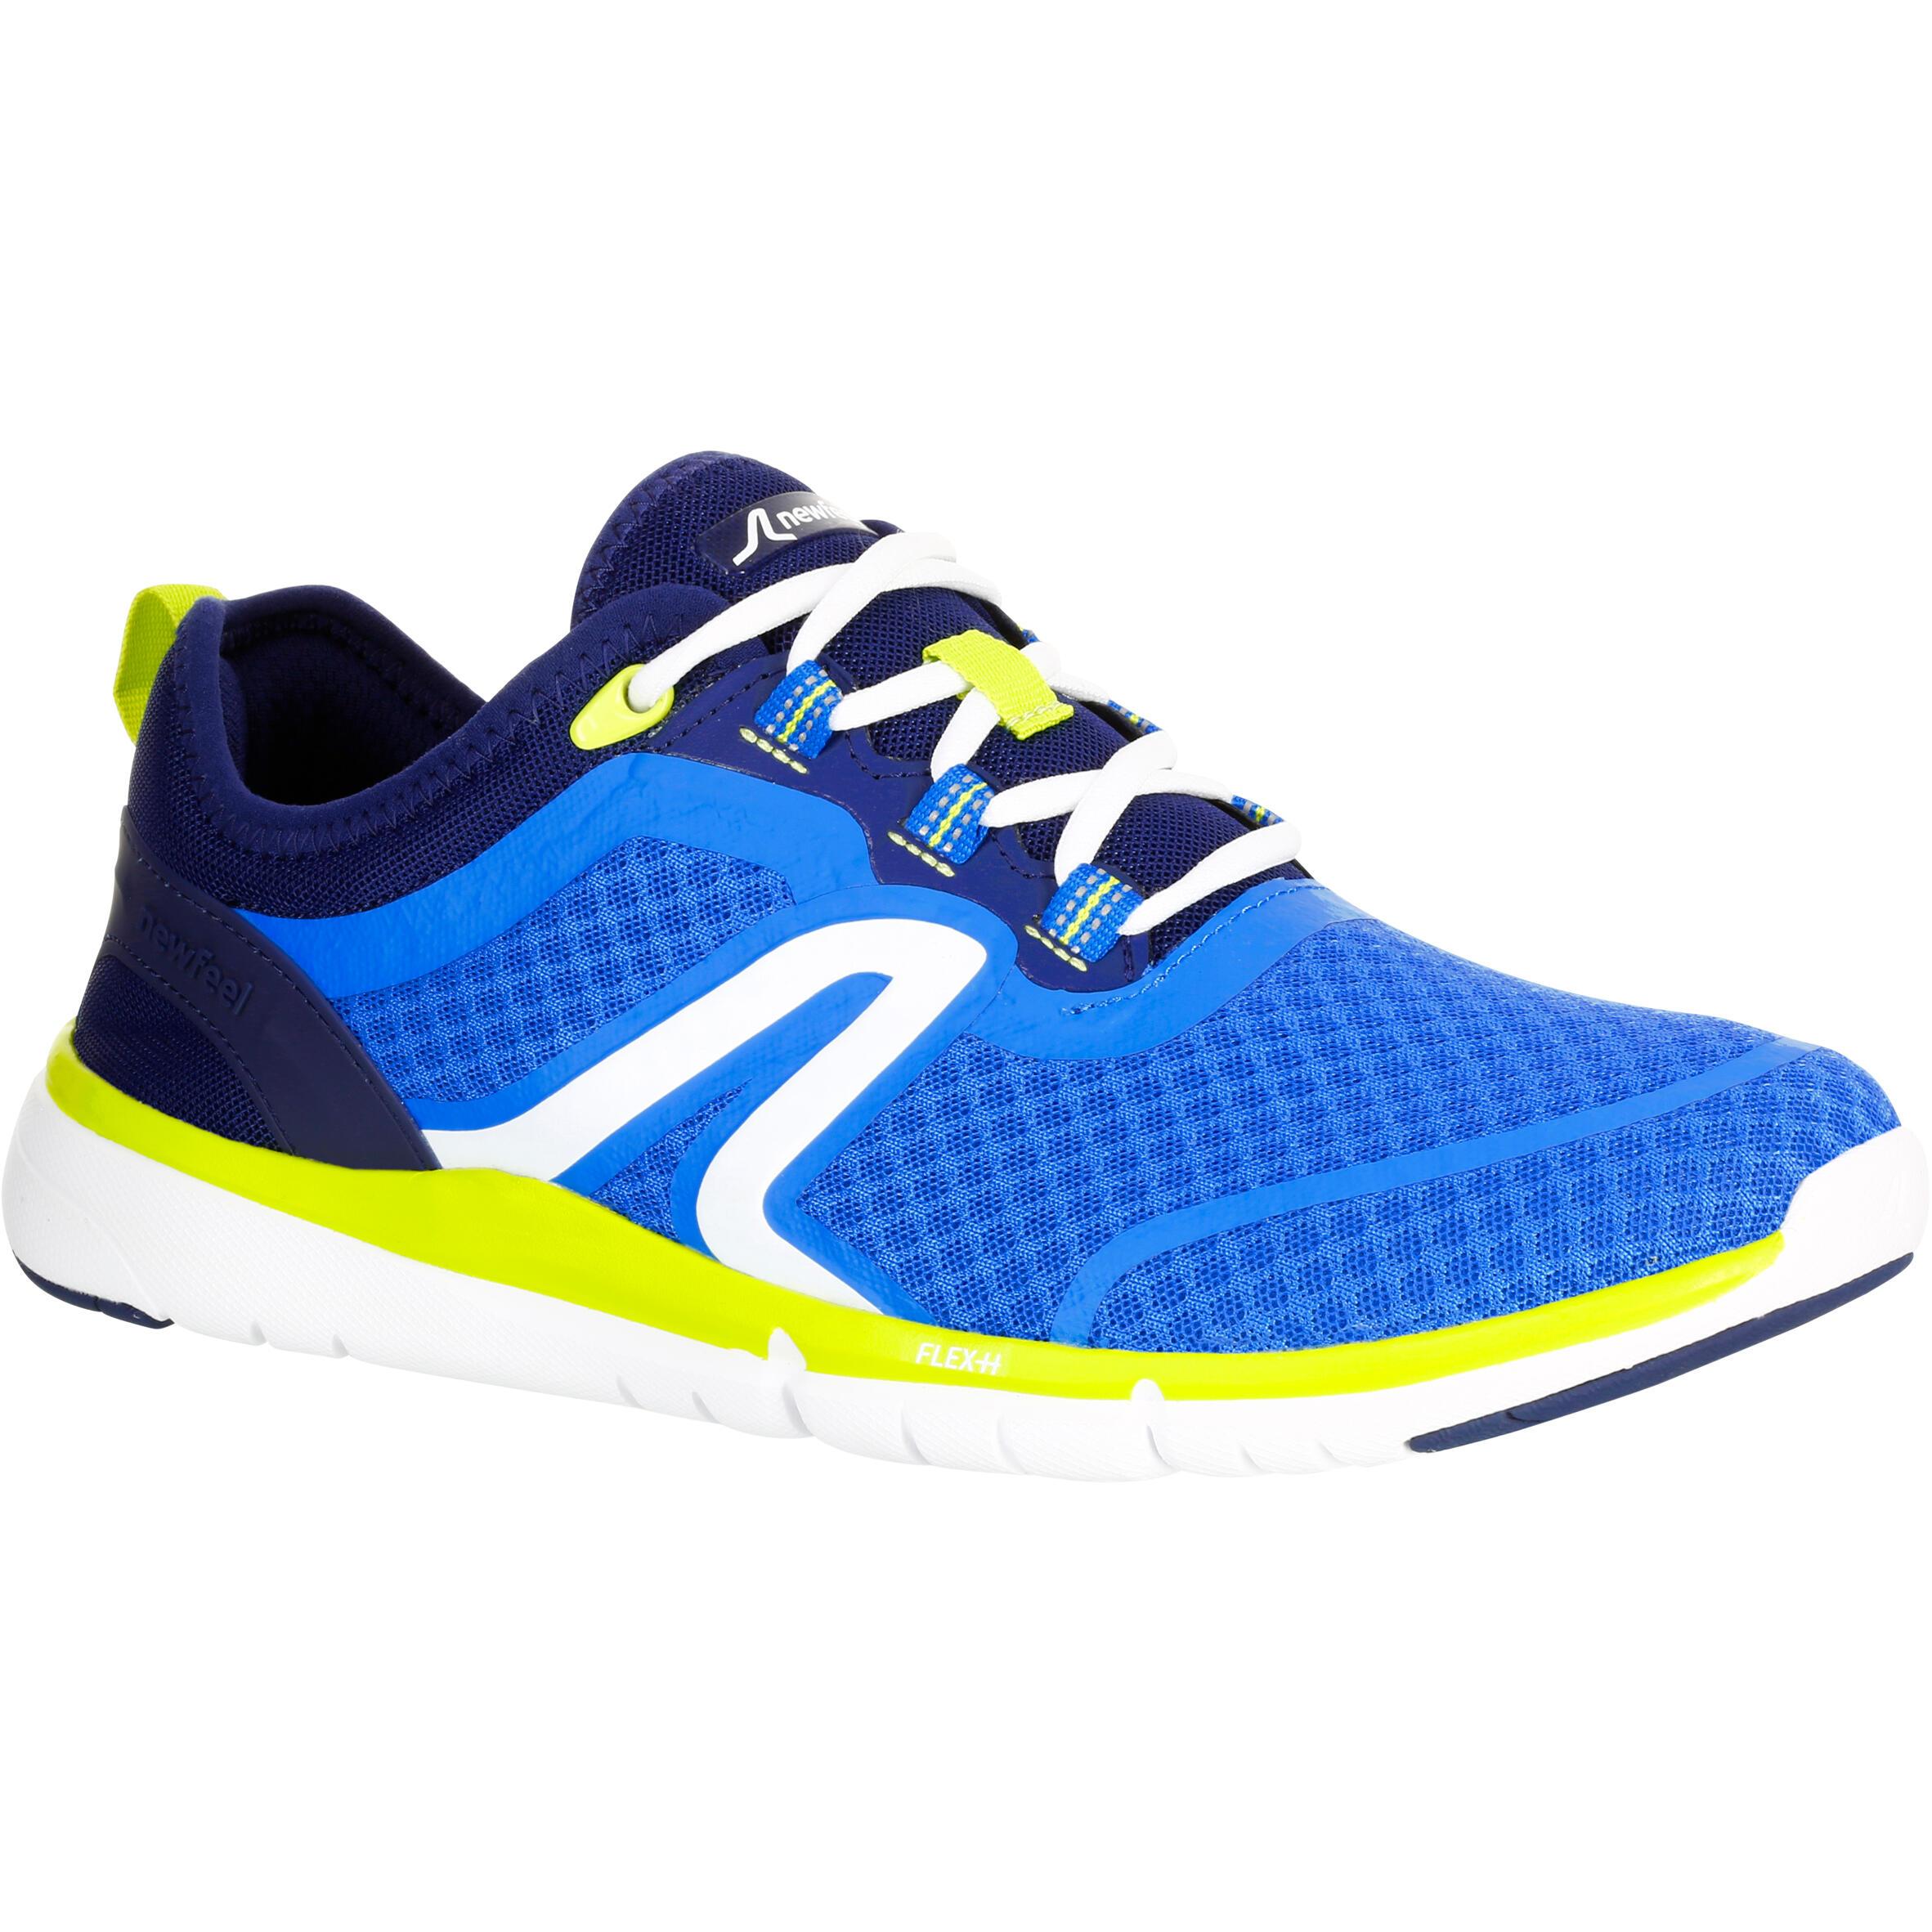 Homme Bleu Jaune Soft Mesh Marche Sportive 540 Chaussures RLq4Aj35